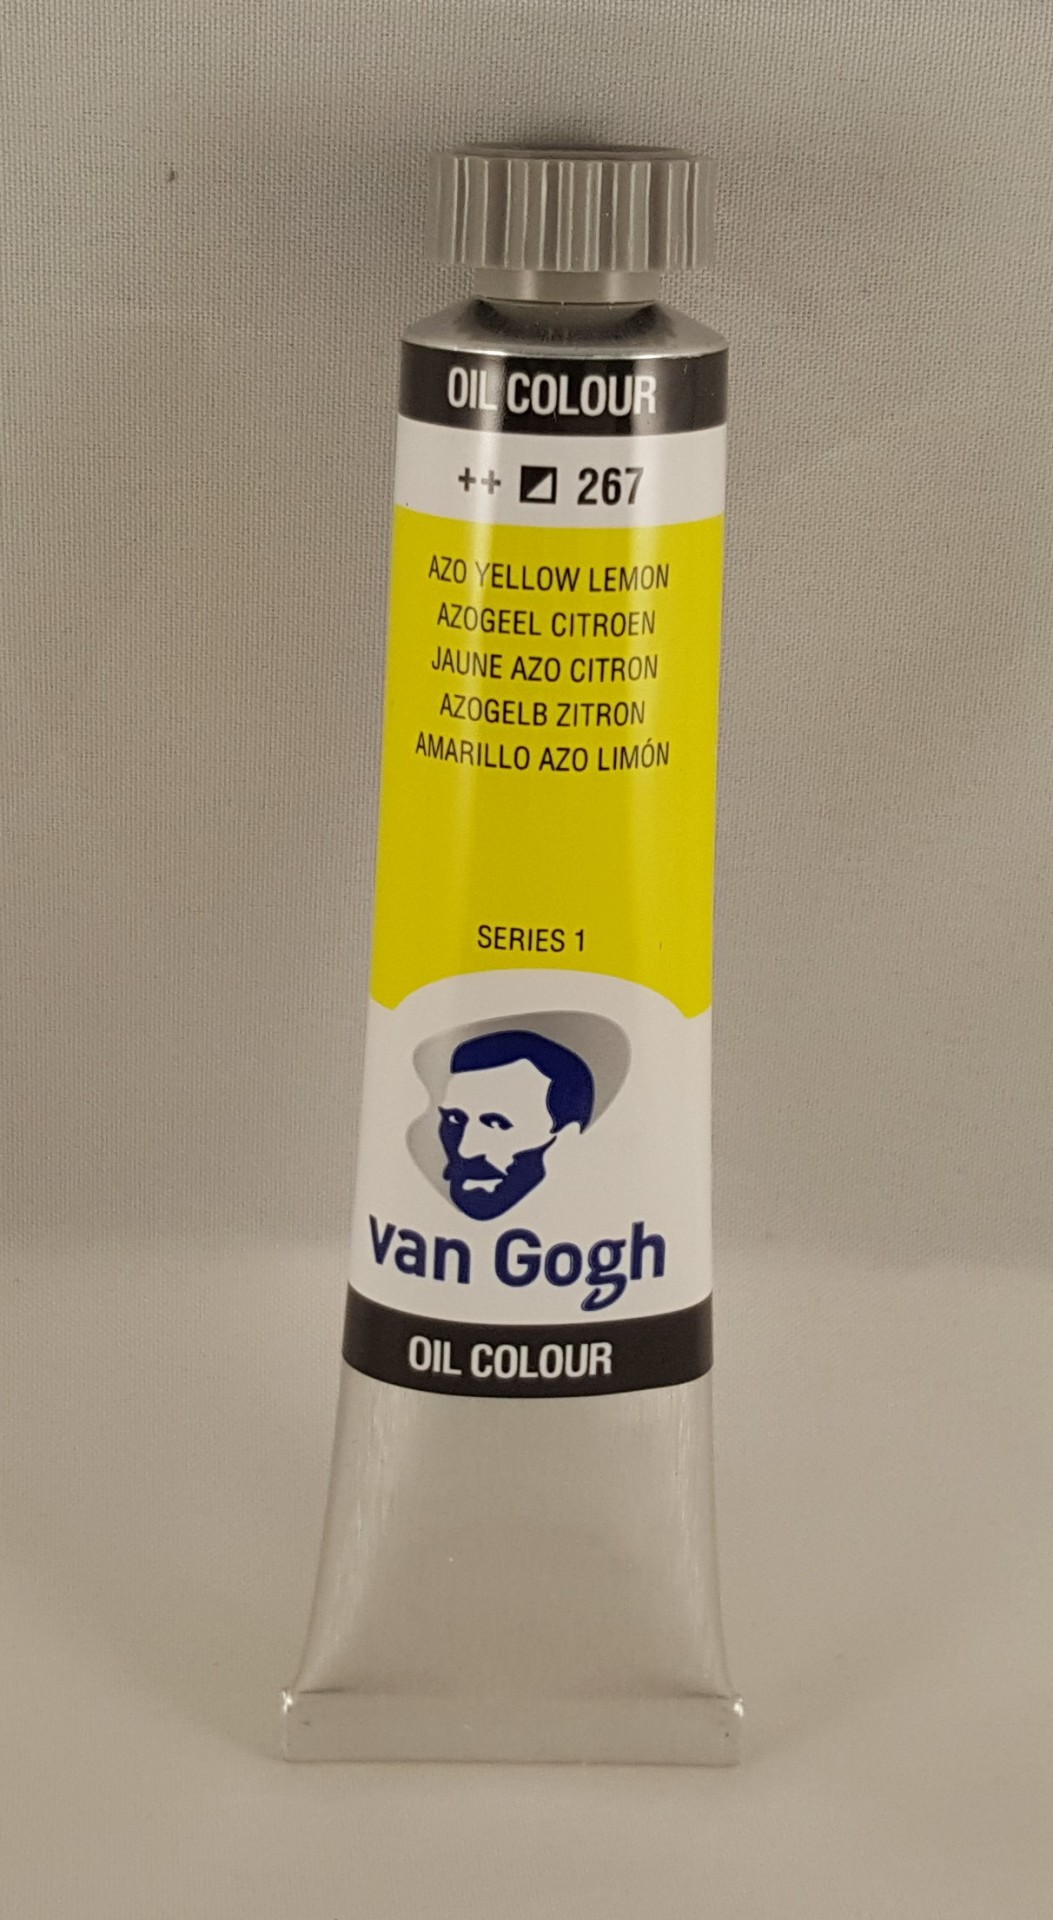 Tinta de óleo Van Gogh azo yellow lemon